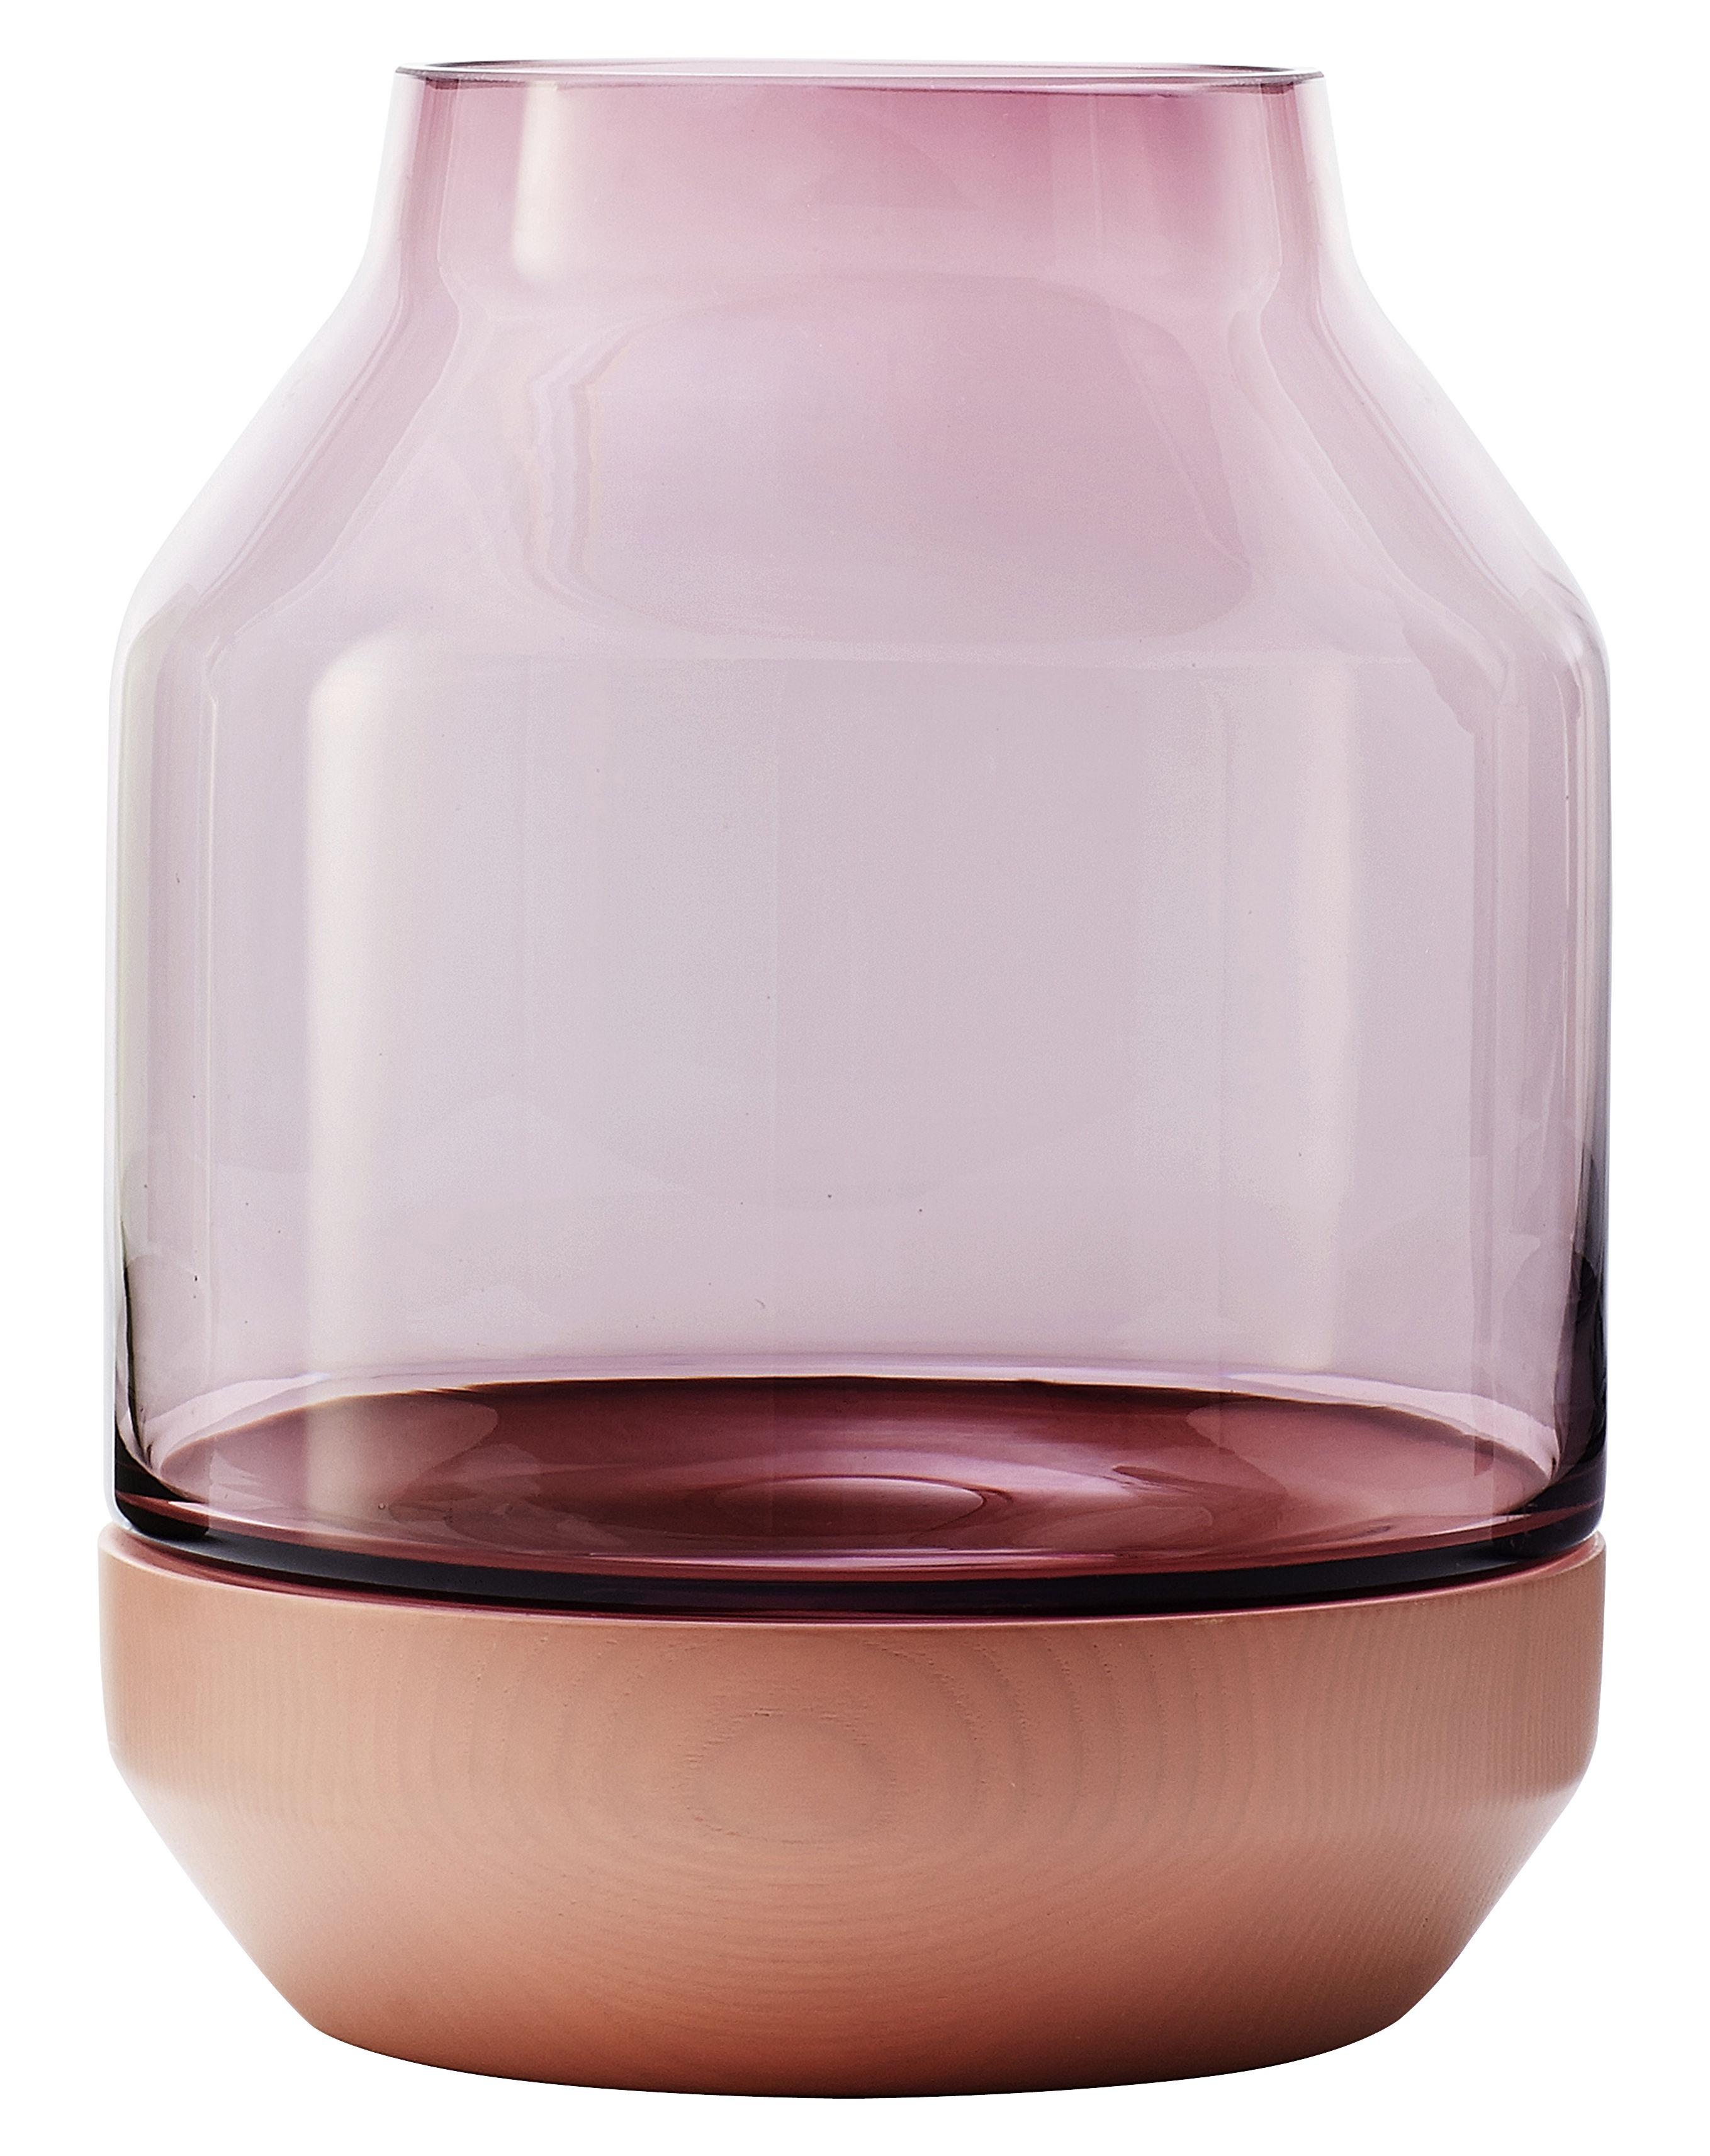 Interni - Vasi - Vaso Elevated di Muuto - Rosa - Frassino tinto, vetro soffiato